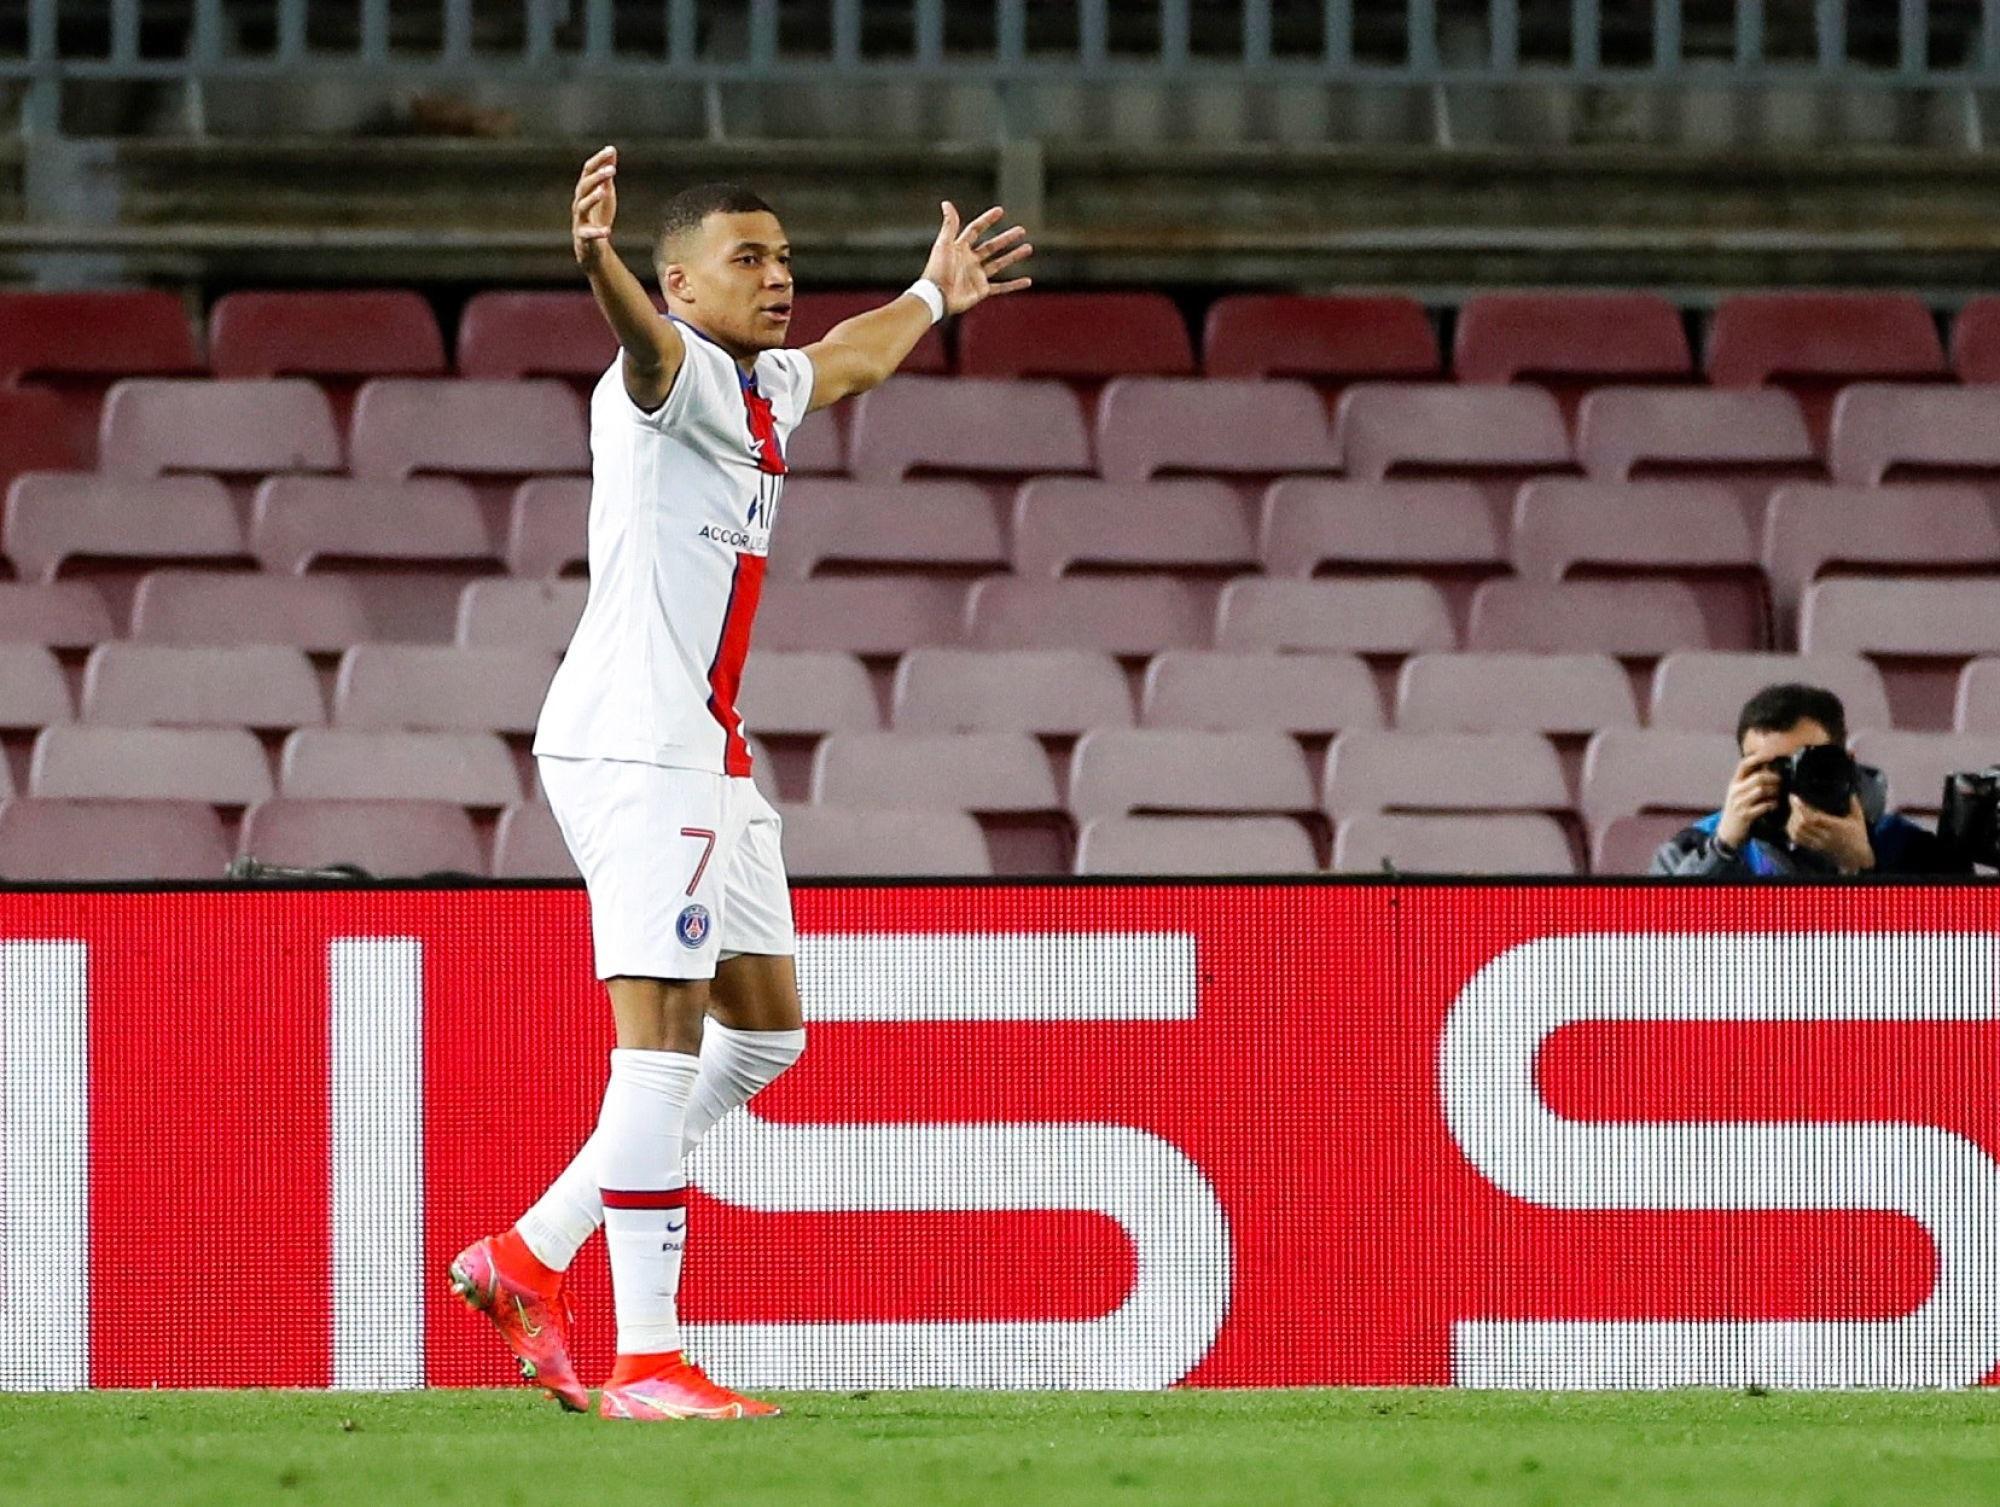 Mercato - AS tenter de relancer le dossier Mbappé, Marca calme le jeu